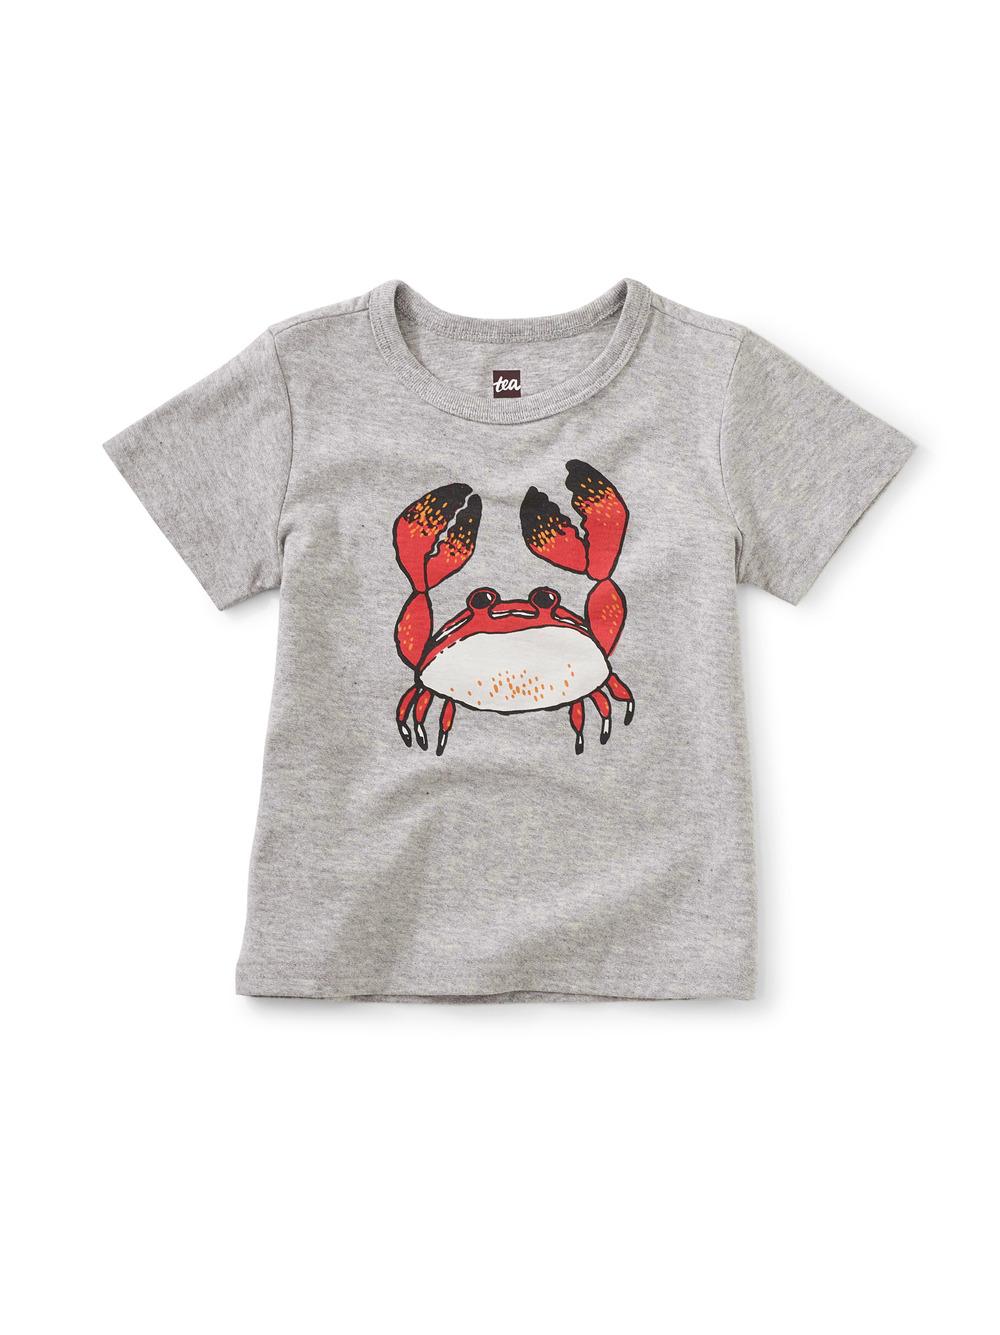 Feeling Crabby Baby Graphic Tee